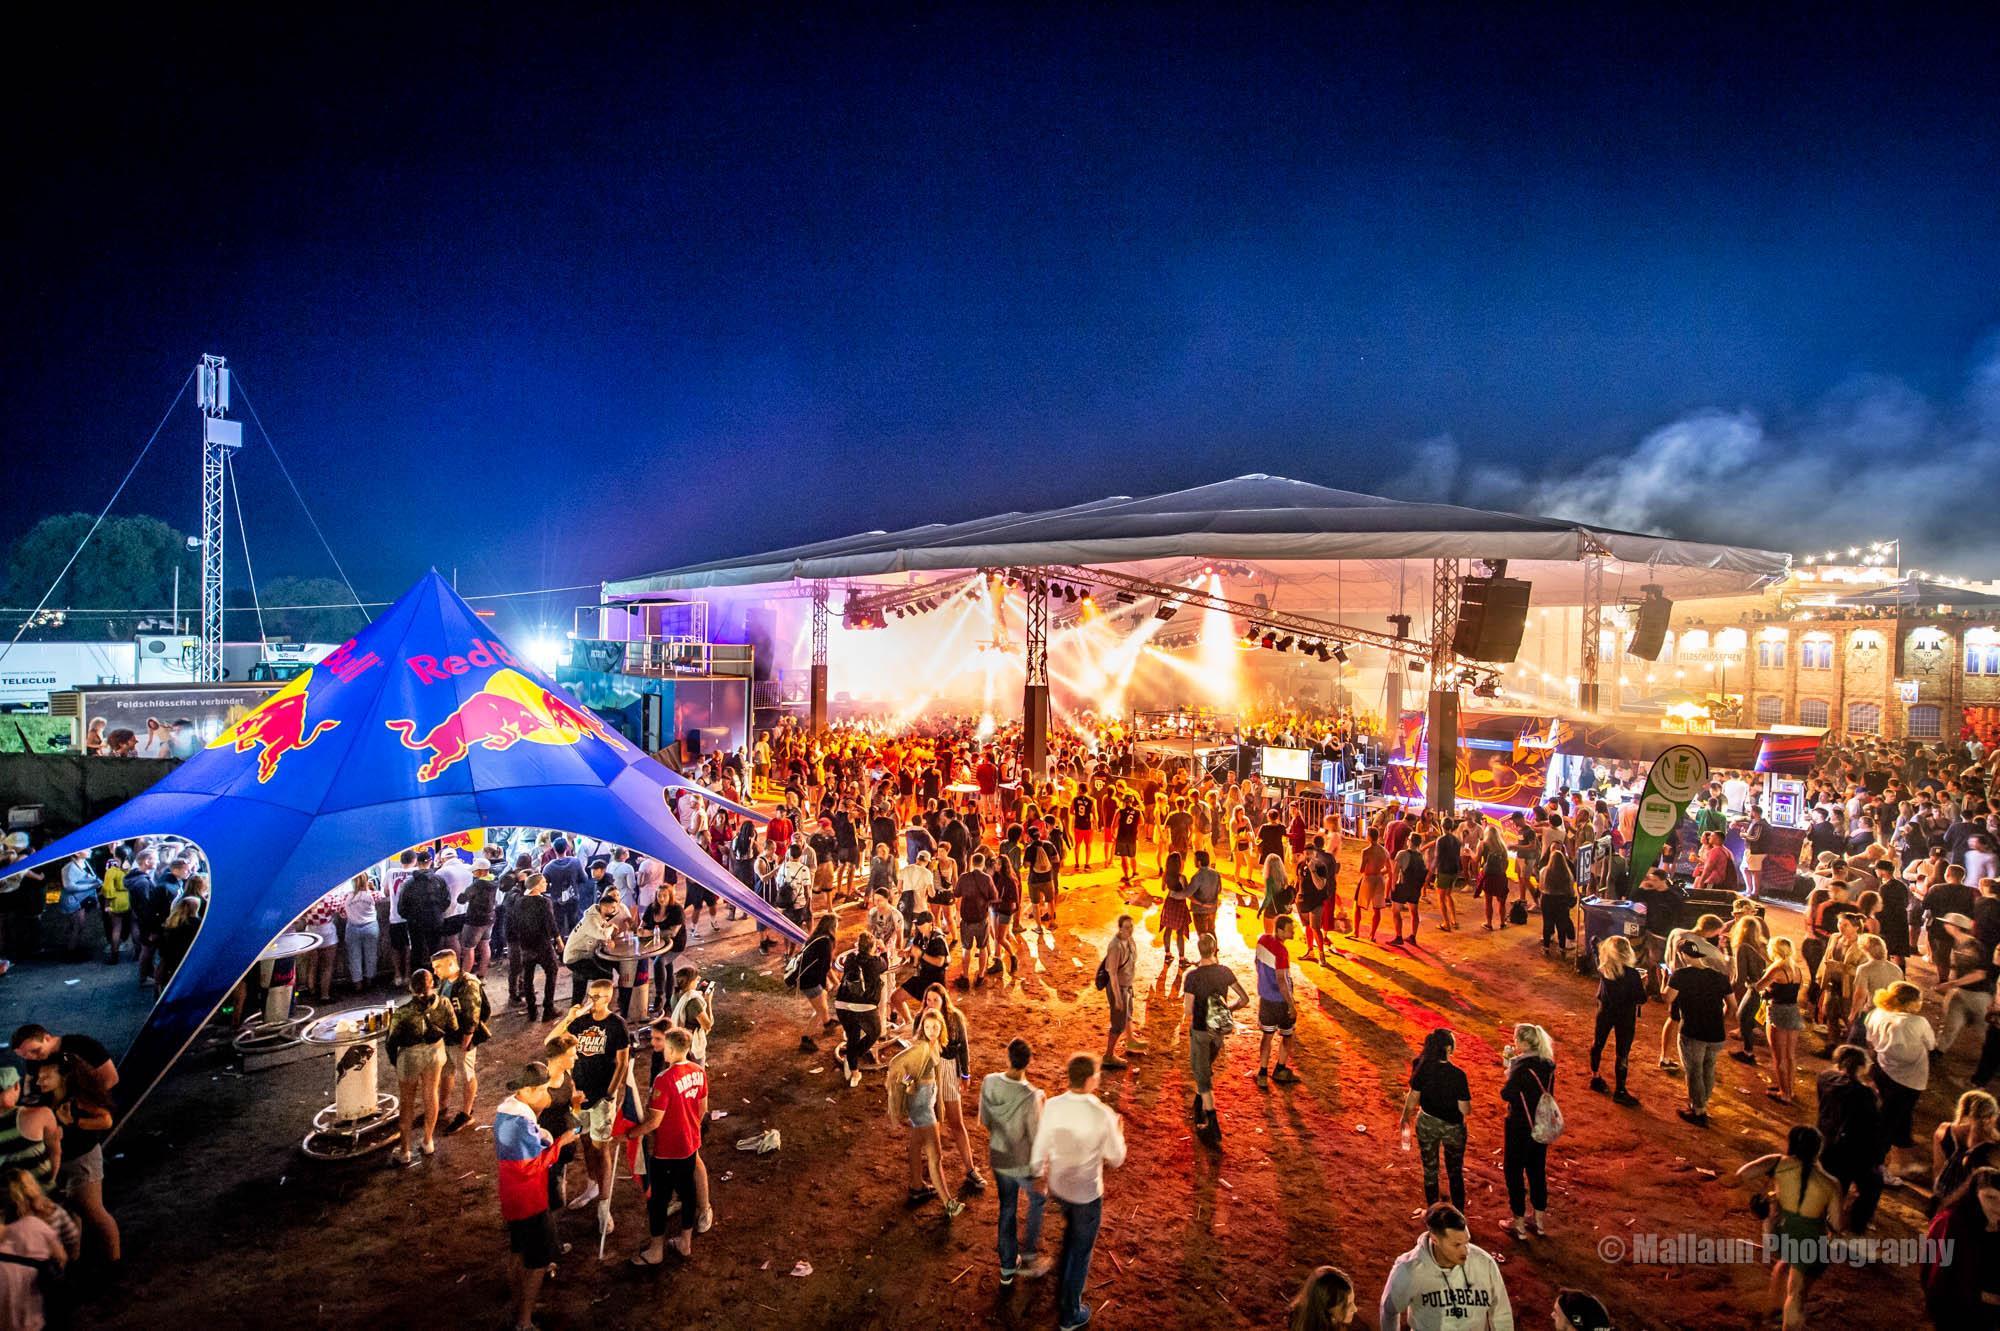 Festival Gelände Openair Frauenfeld, Hochbeinstativ 6 Meter © Mallaun Photography